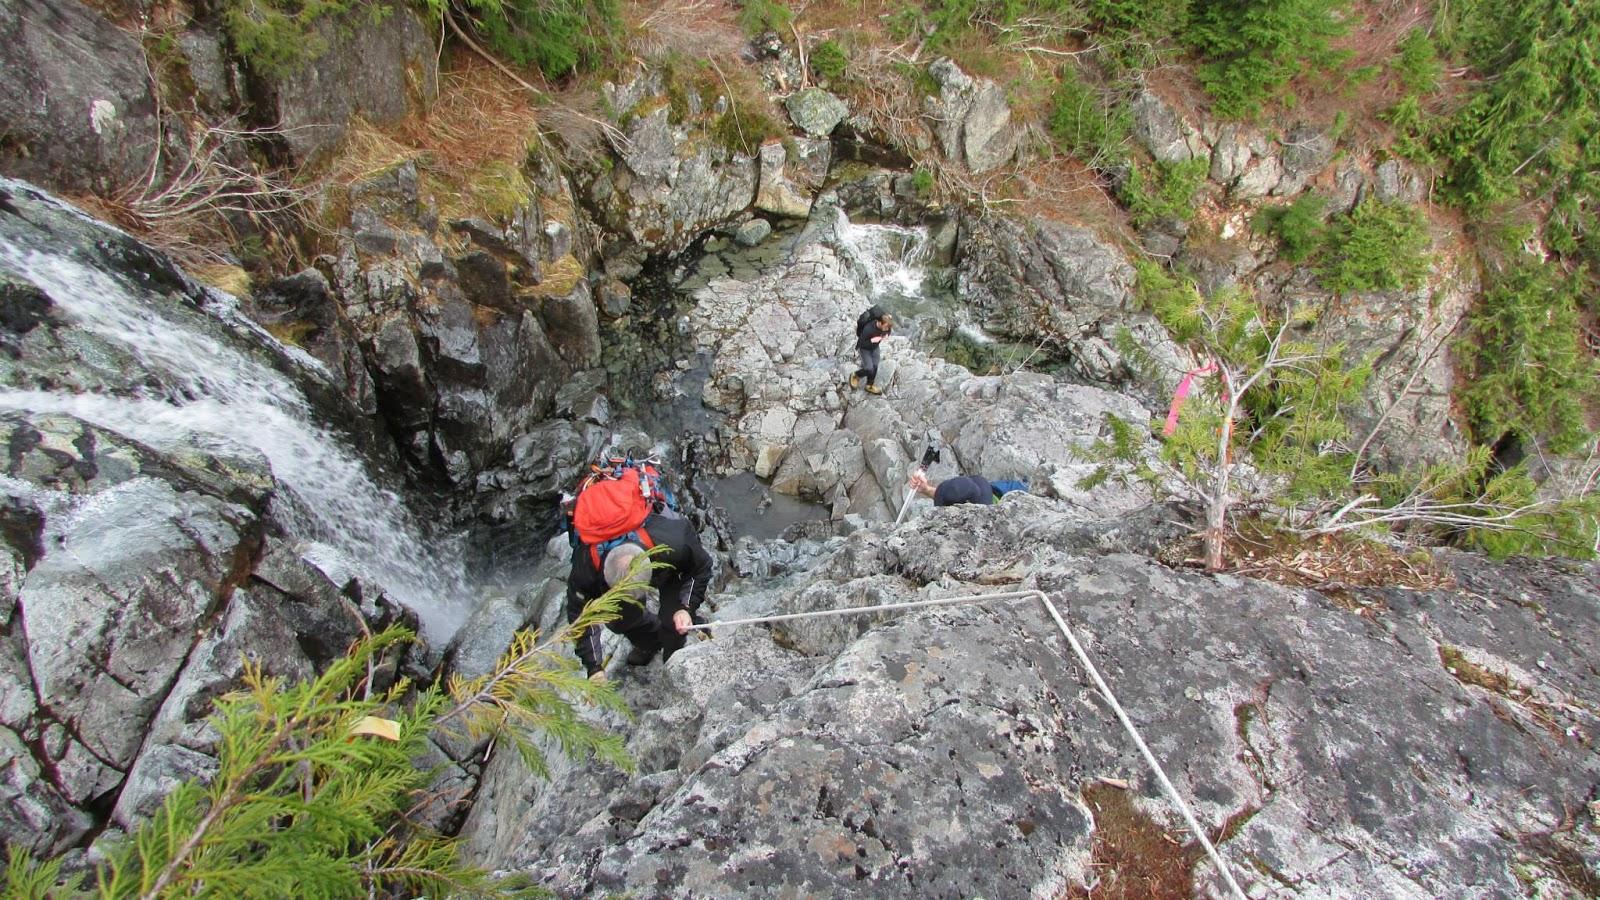 Photograph by Phil Jackson, Rick ascending toward Triple Peak